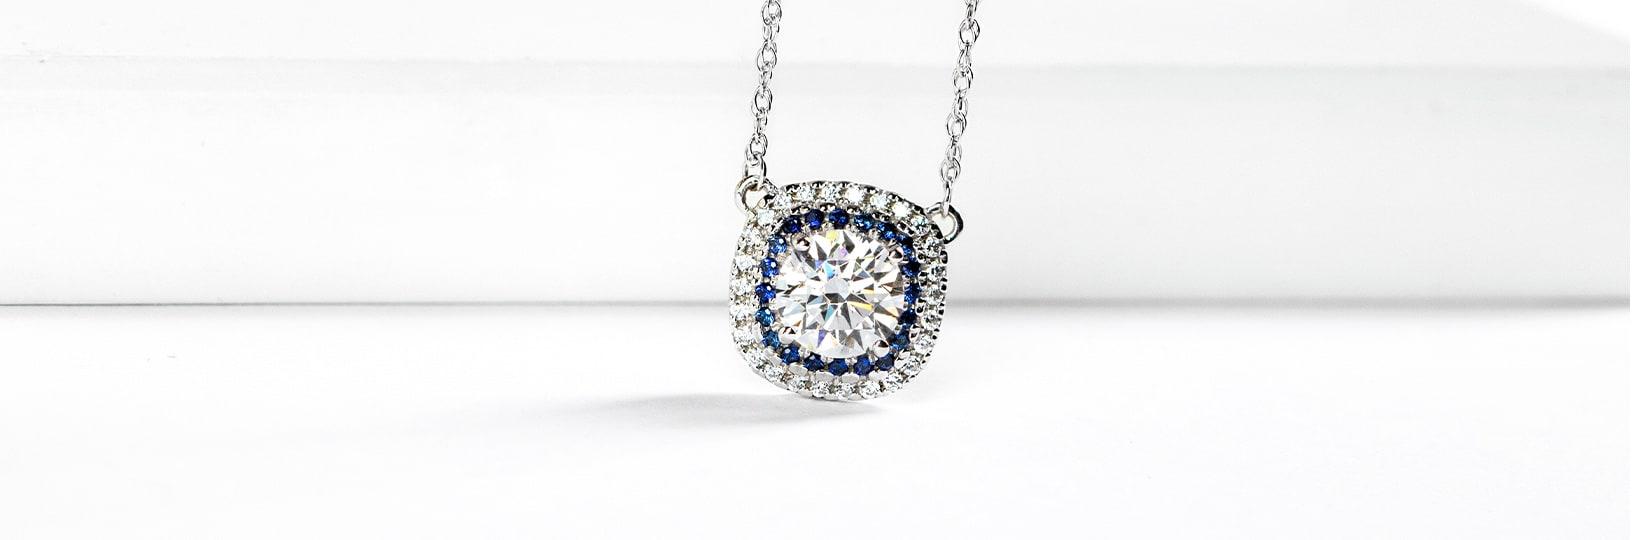 Halo wedding necklace.